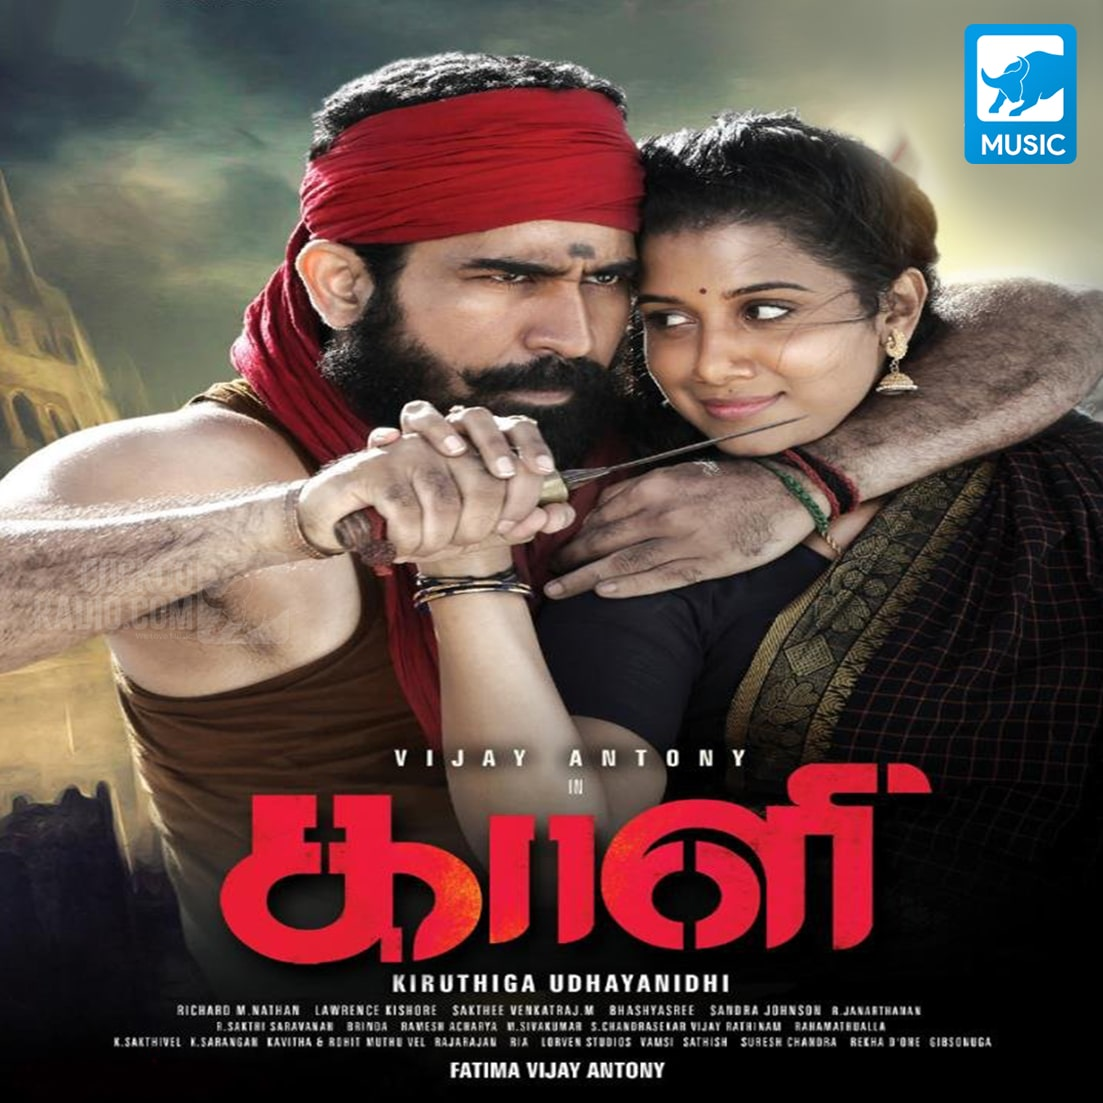 Kaali is a 2018 Indian Tamil-language historical action film directed by Kiruthiga Udhayanidhi, starring Vijay Antony in the lead alongside Anjali, Sunaina, Shilpa